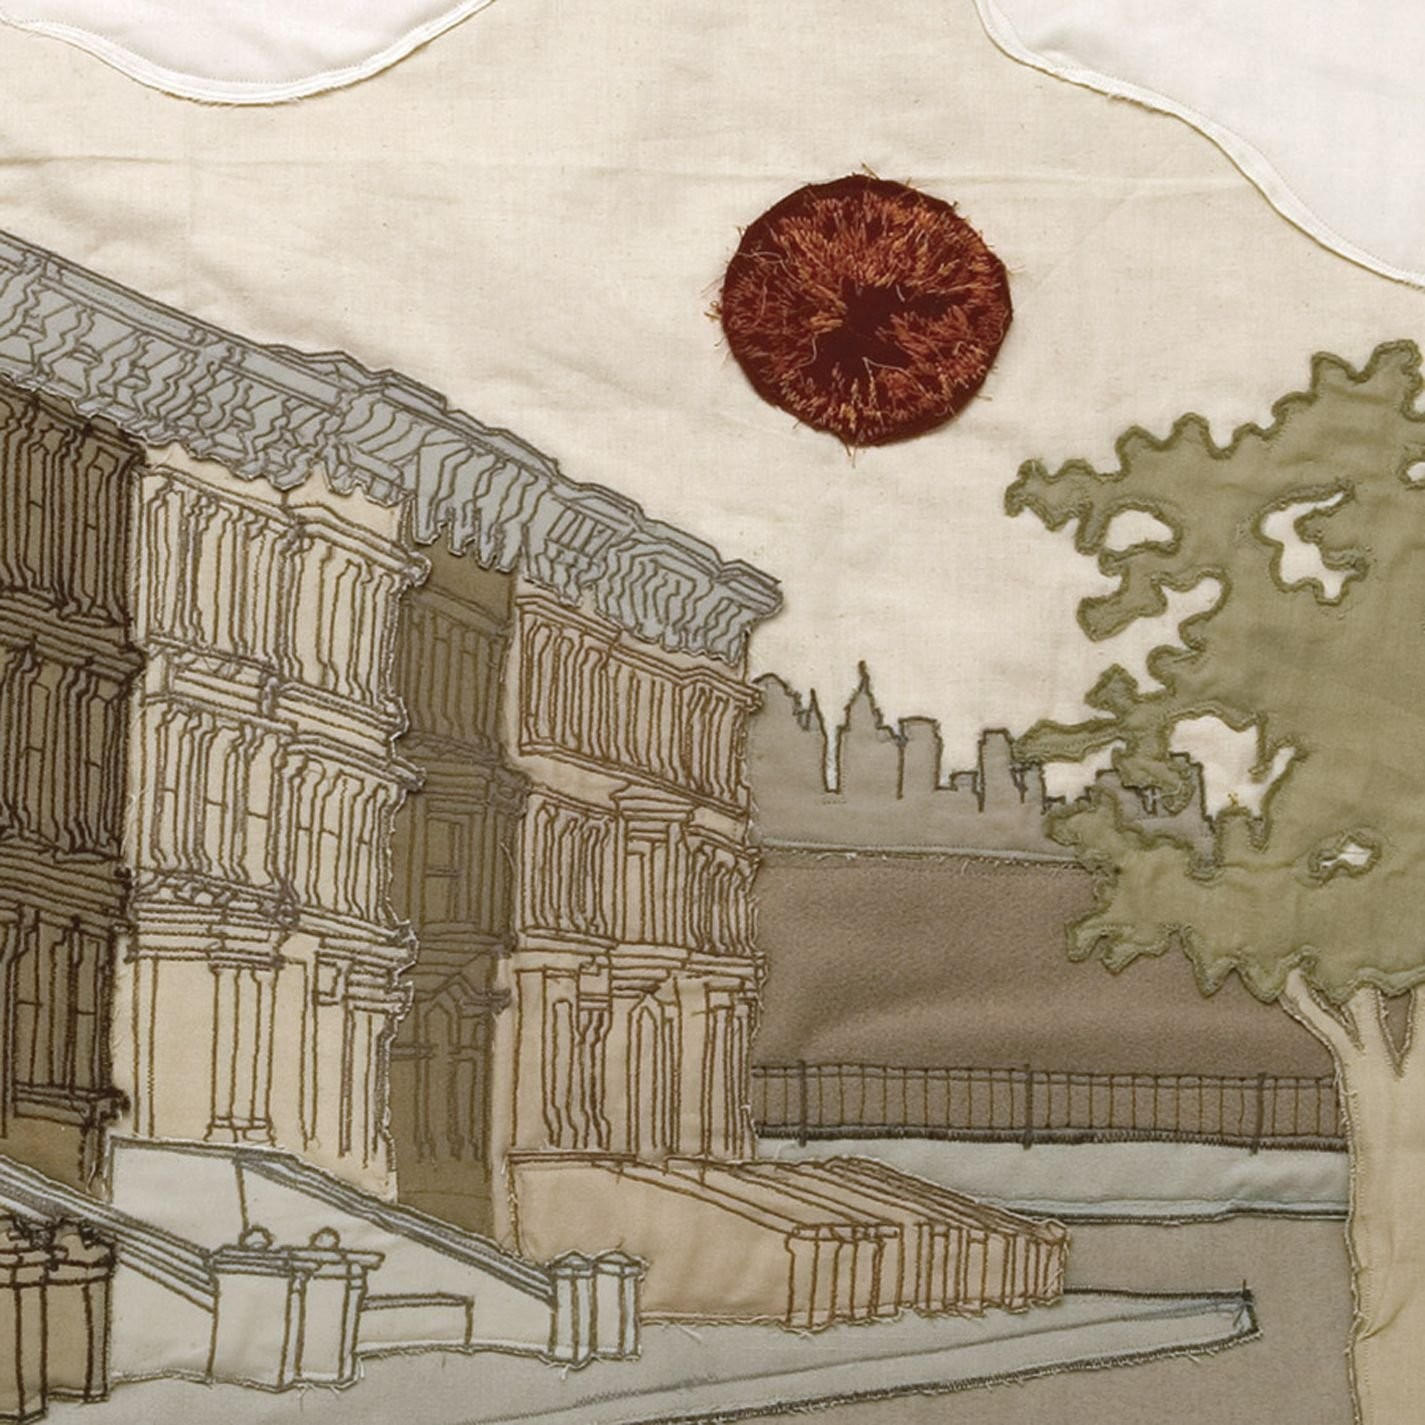 Bright Eyes - I'm Wide Awake, It's Morning (Remastered) LP